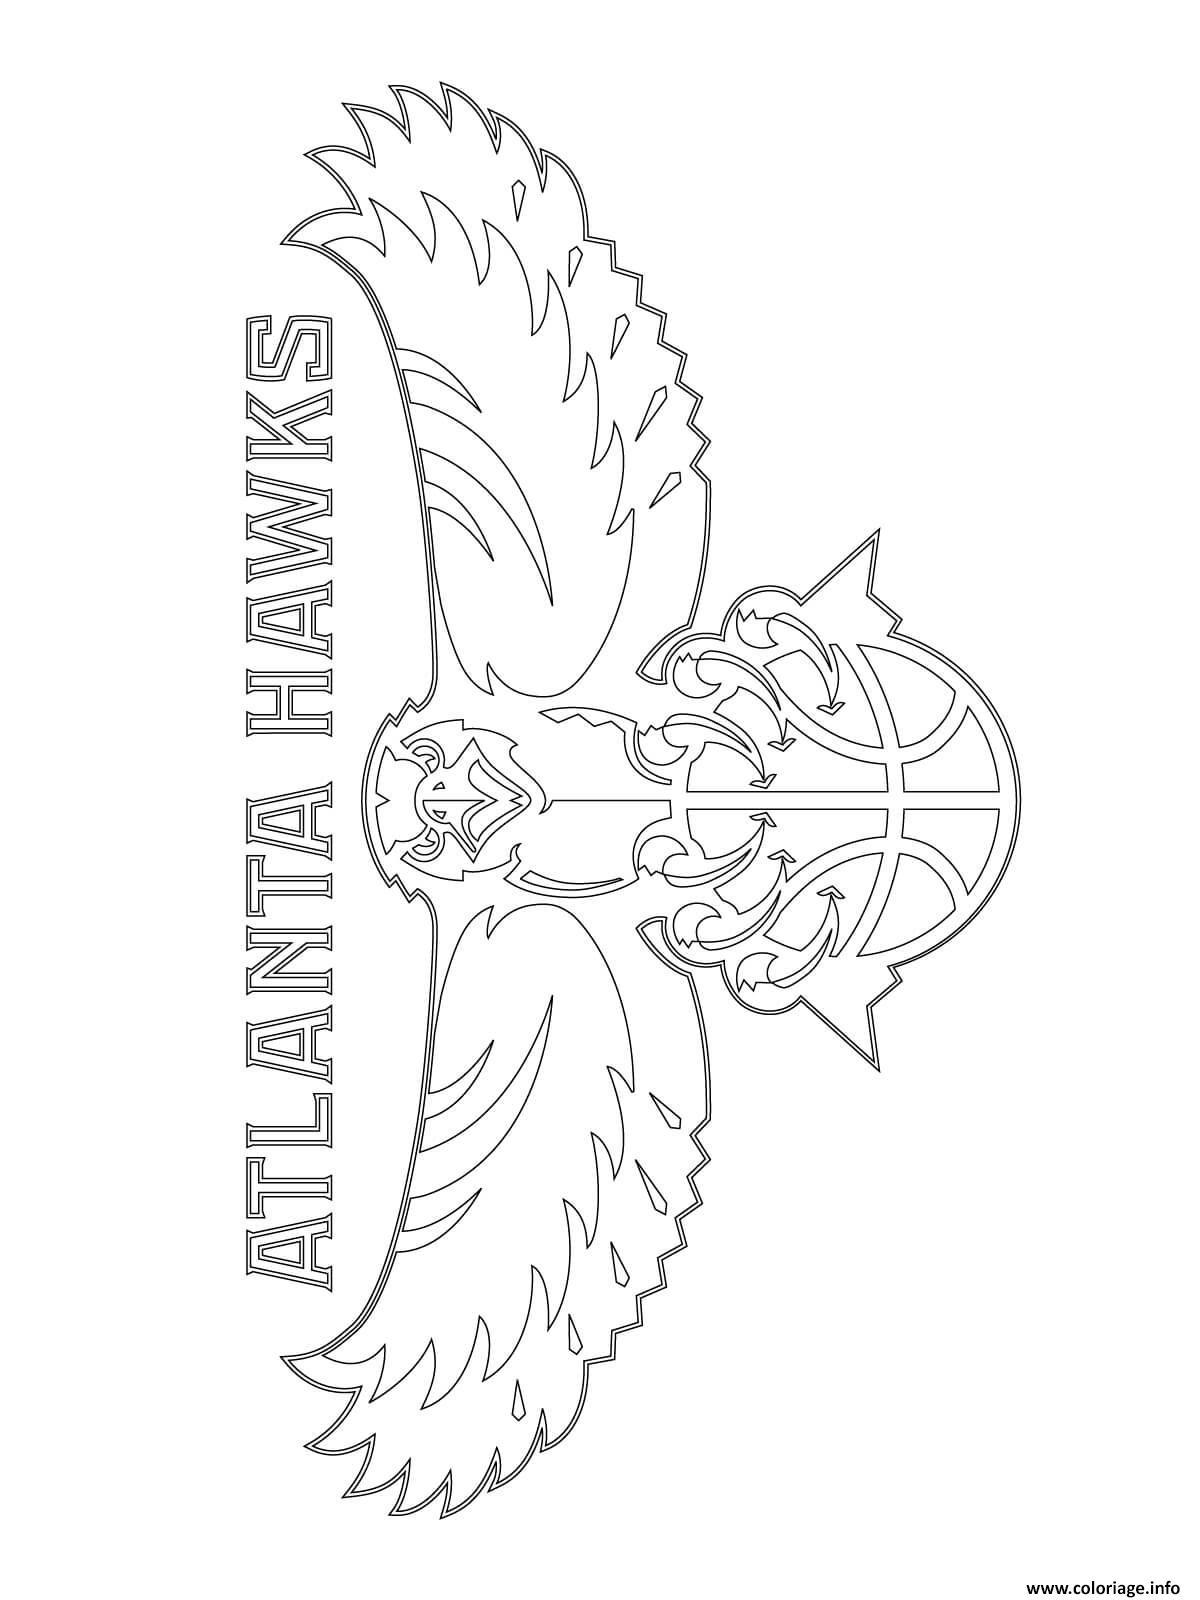 Dessin atlanta hawks logo nba sport Coloriage Gratuit à Imprimer